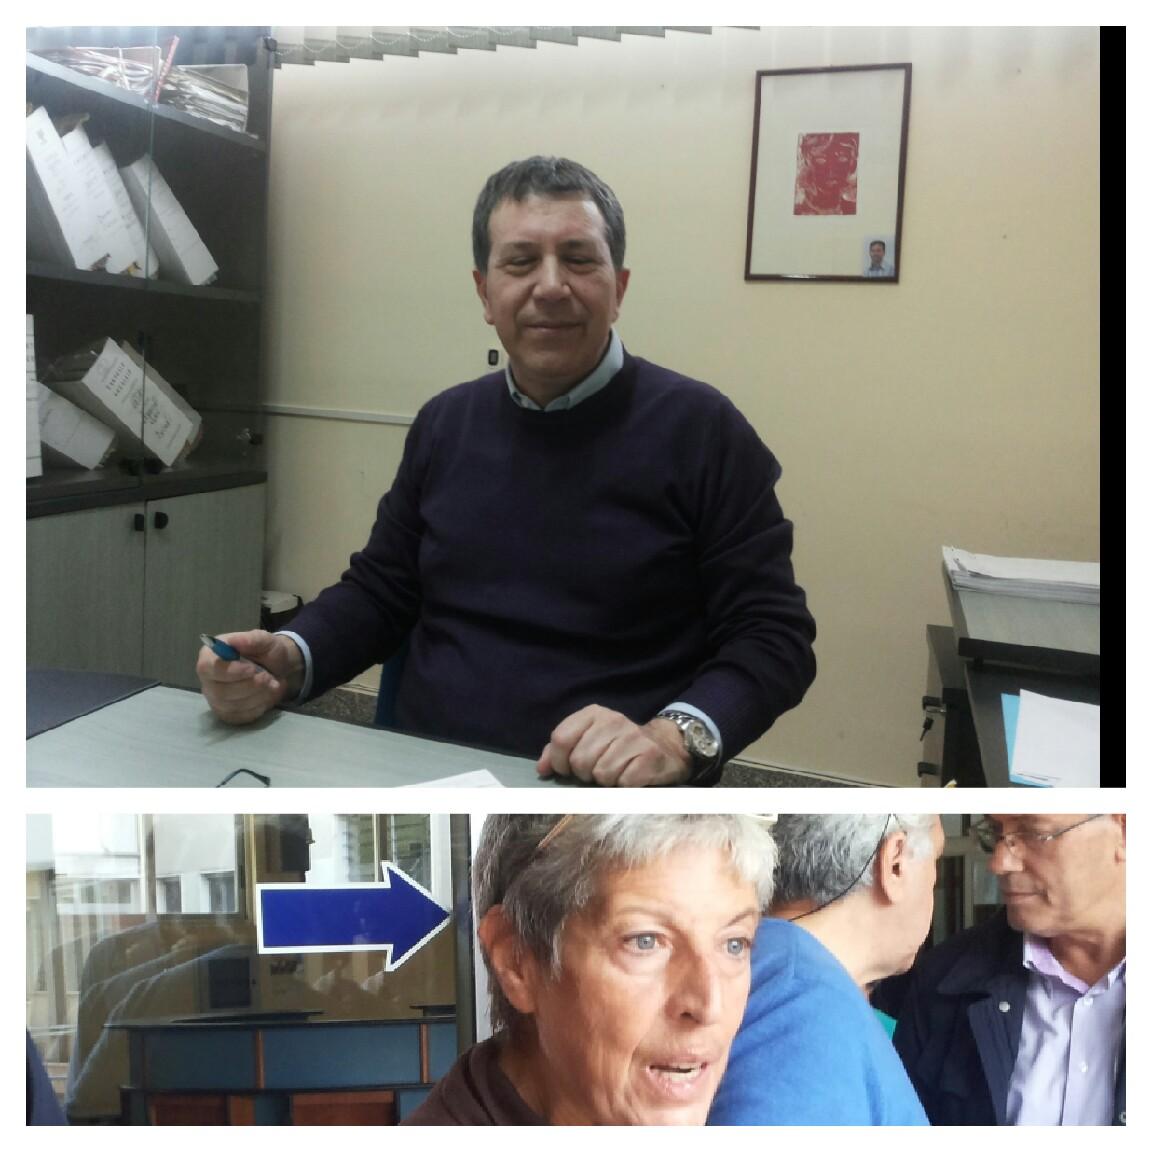 Pietro-Spinelli-Margaret-Cittadino-CGIL